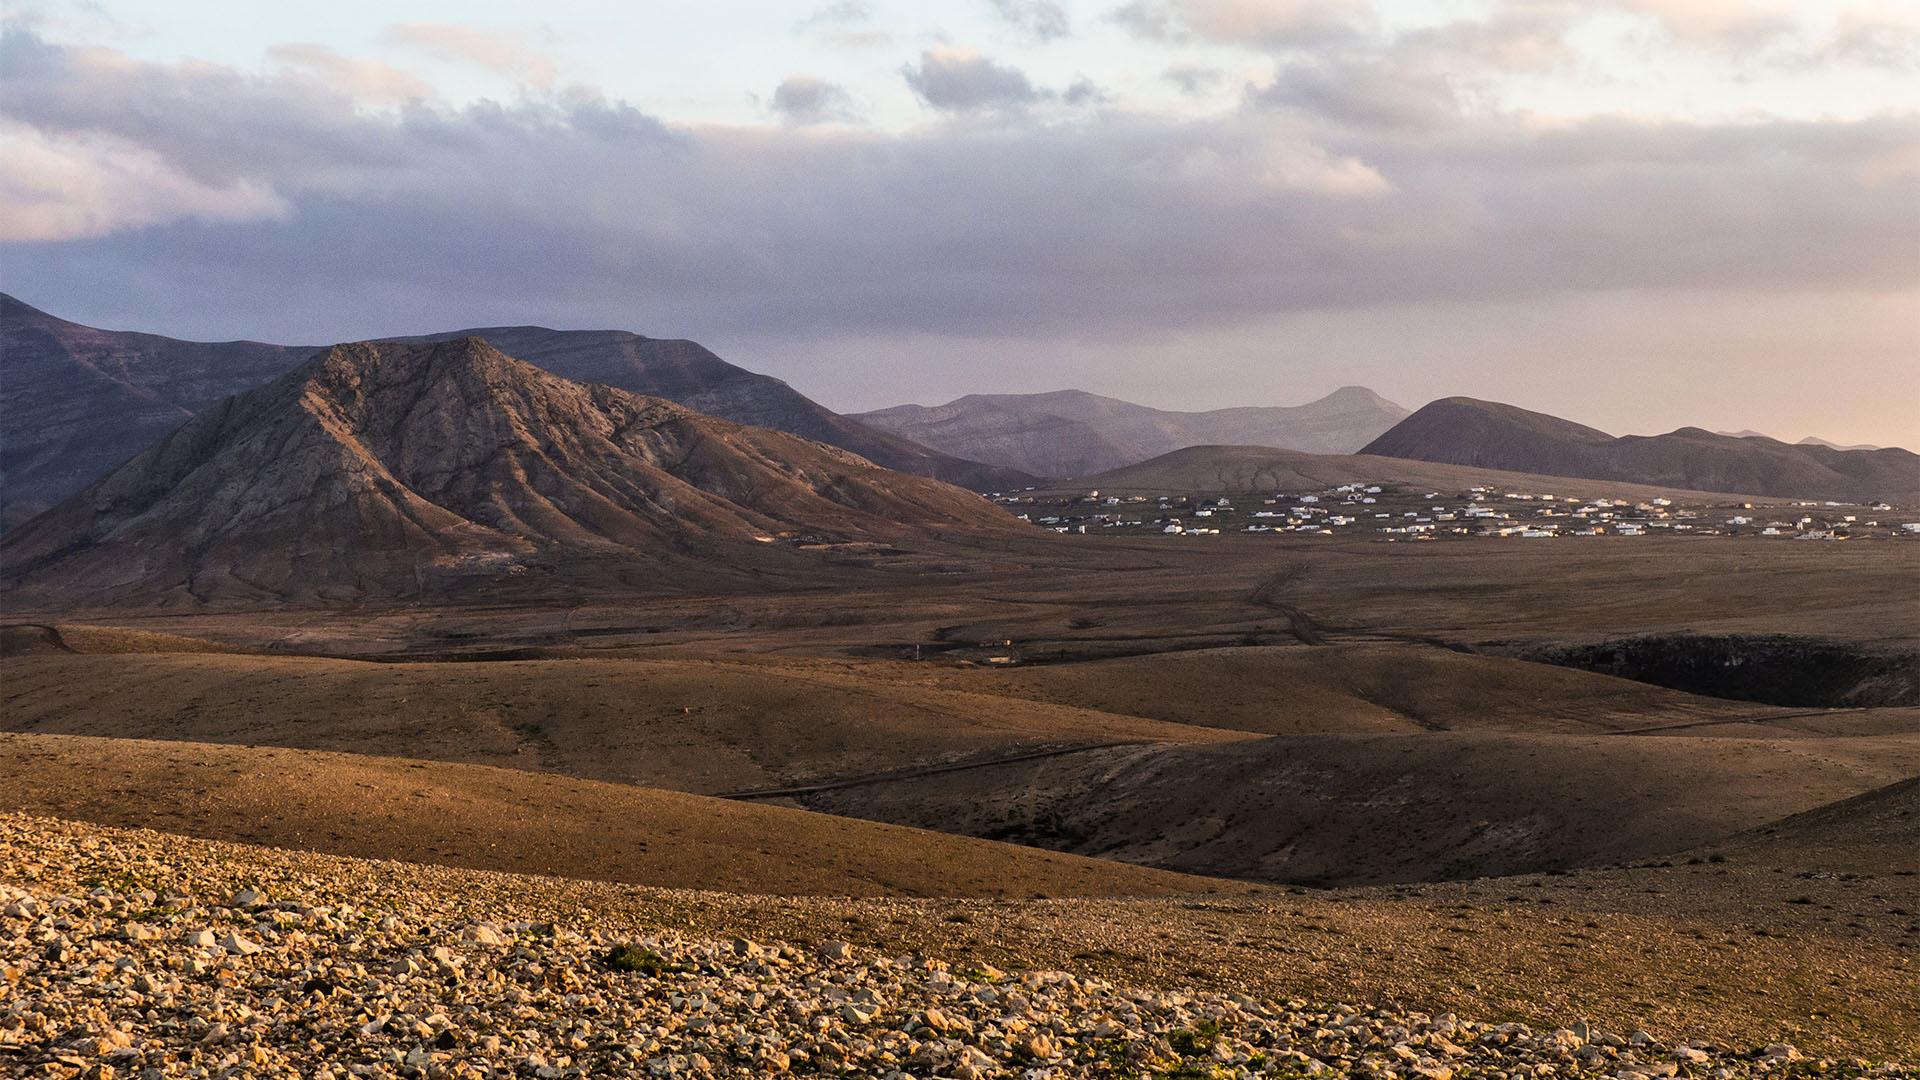 Sehenswürdigkeiten Fuerteventuras: Tindaya – Barranco Encantados